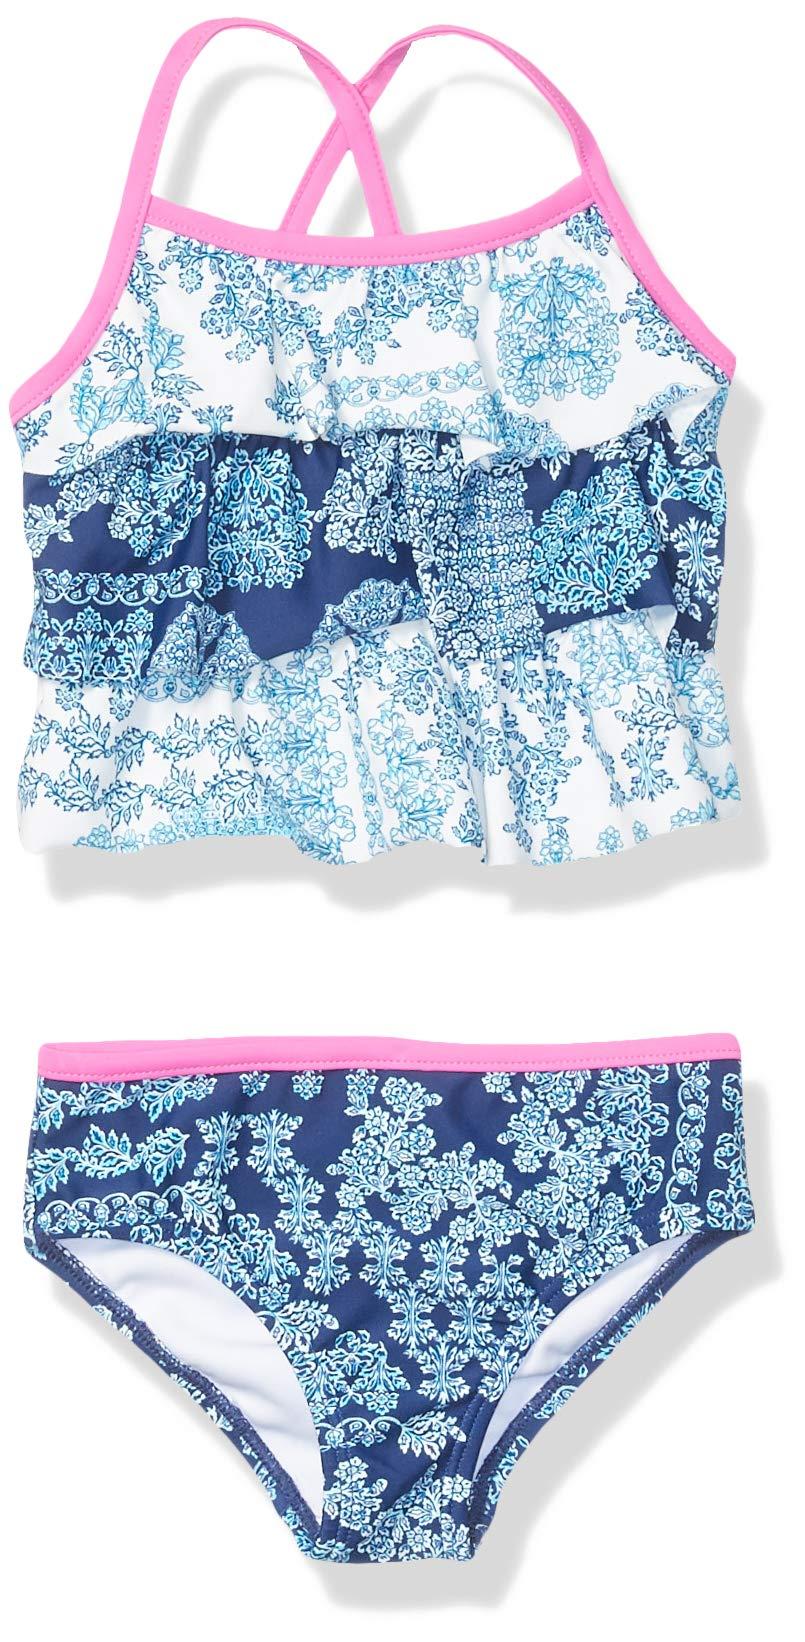 Tommy Bahama Girls' Baby 2-Piece Swimsuit Bathingsuit Bikini